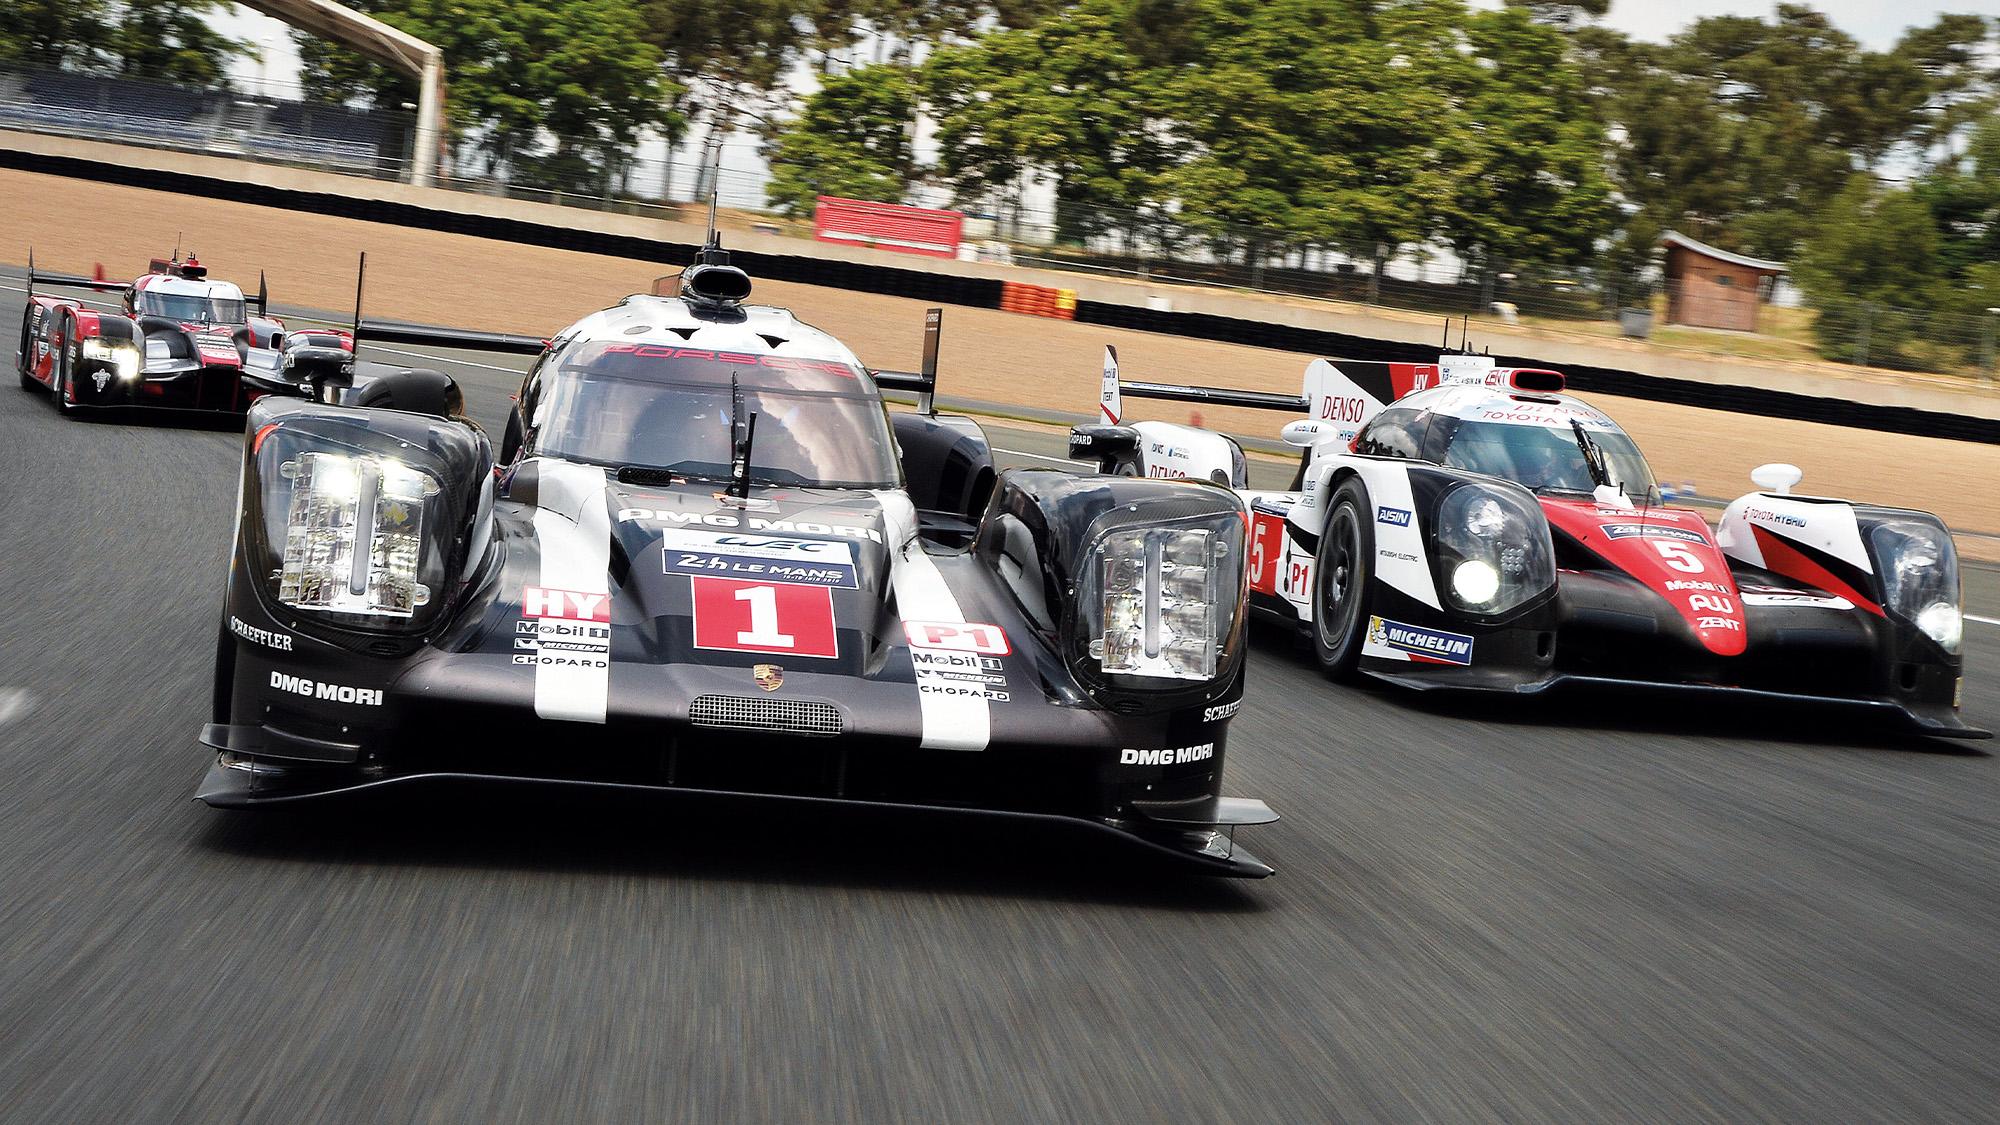 Audi Toyota and Porsche LMP1 cars